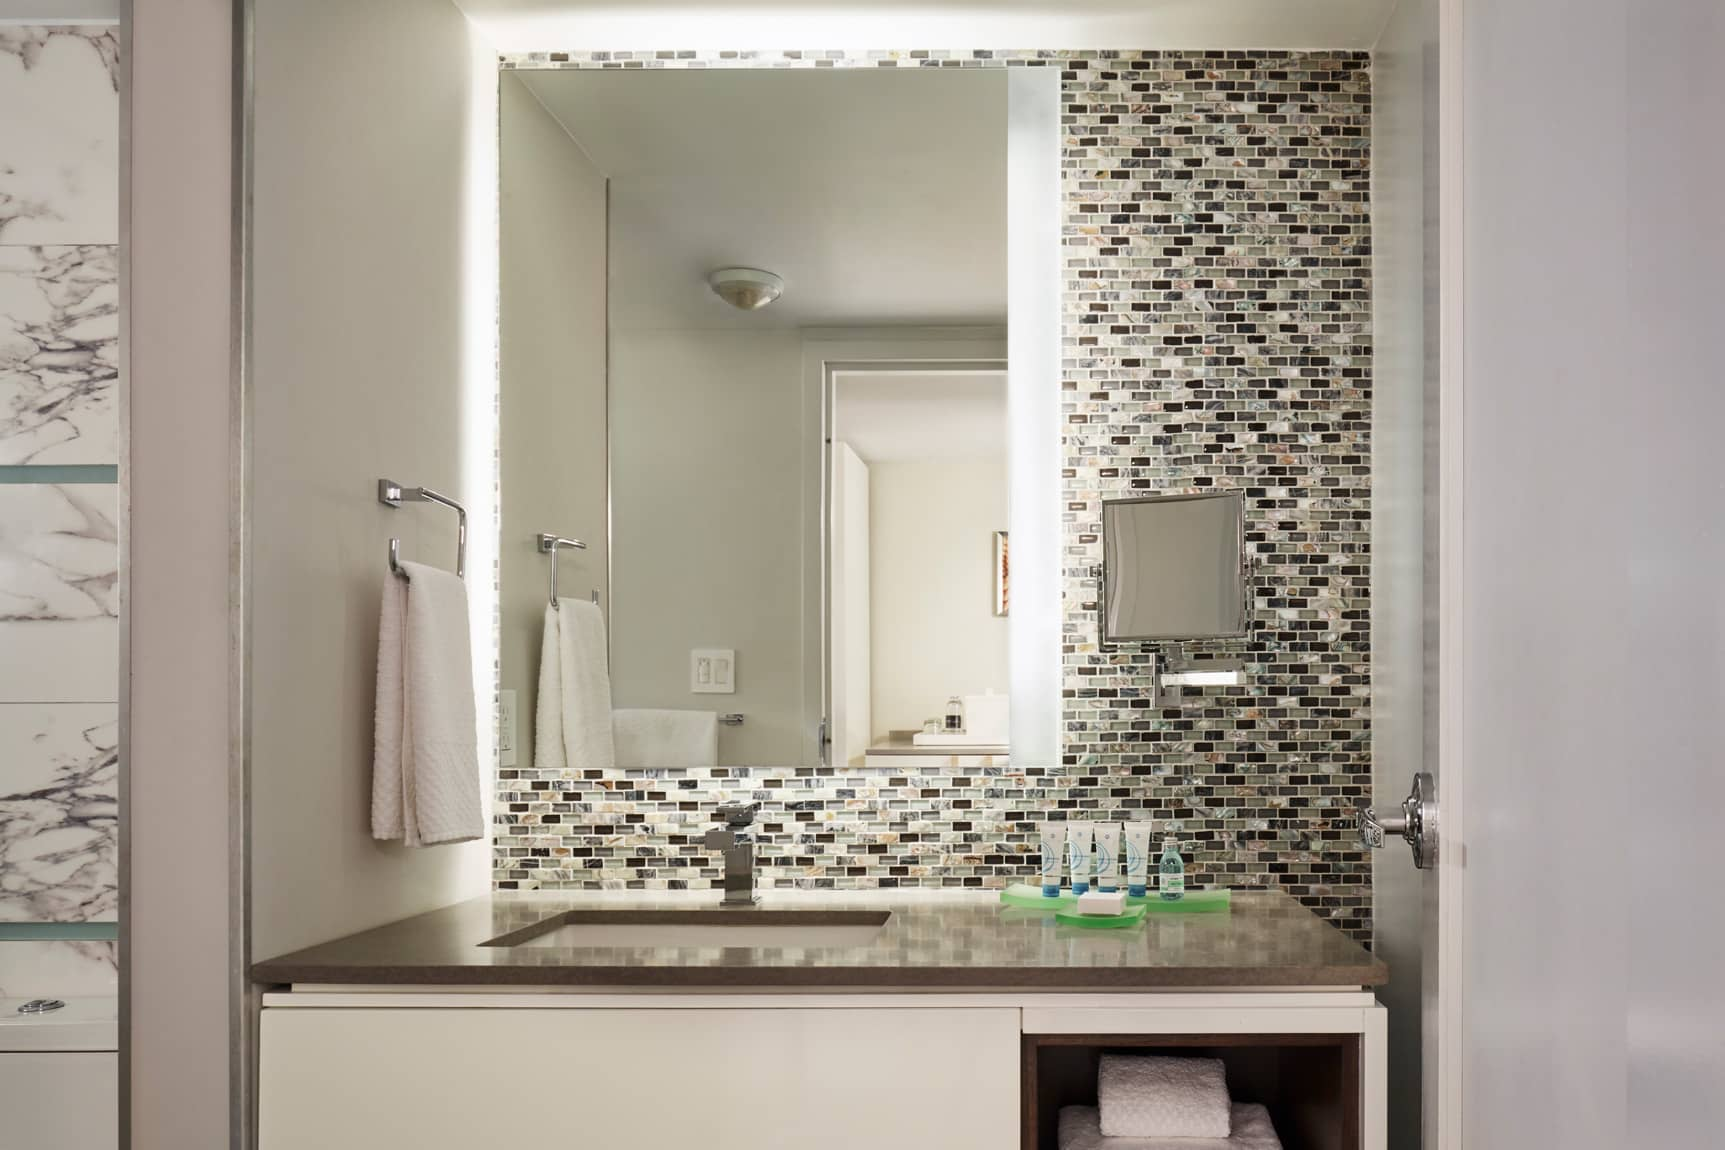 Waterstone   Bathroom   Boca Raton, FL   Interior Designers